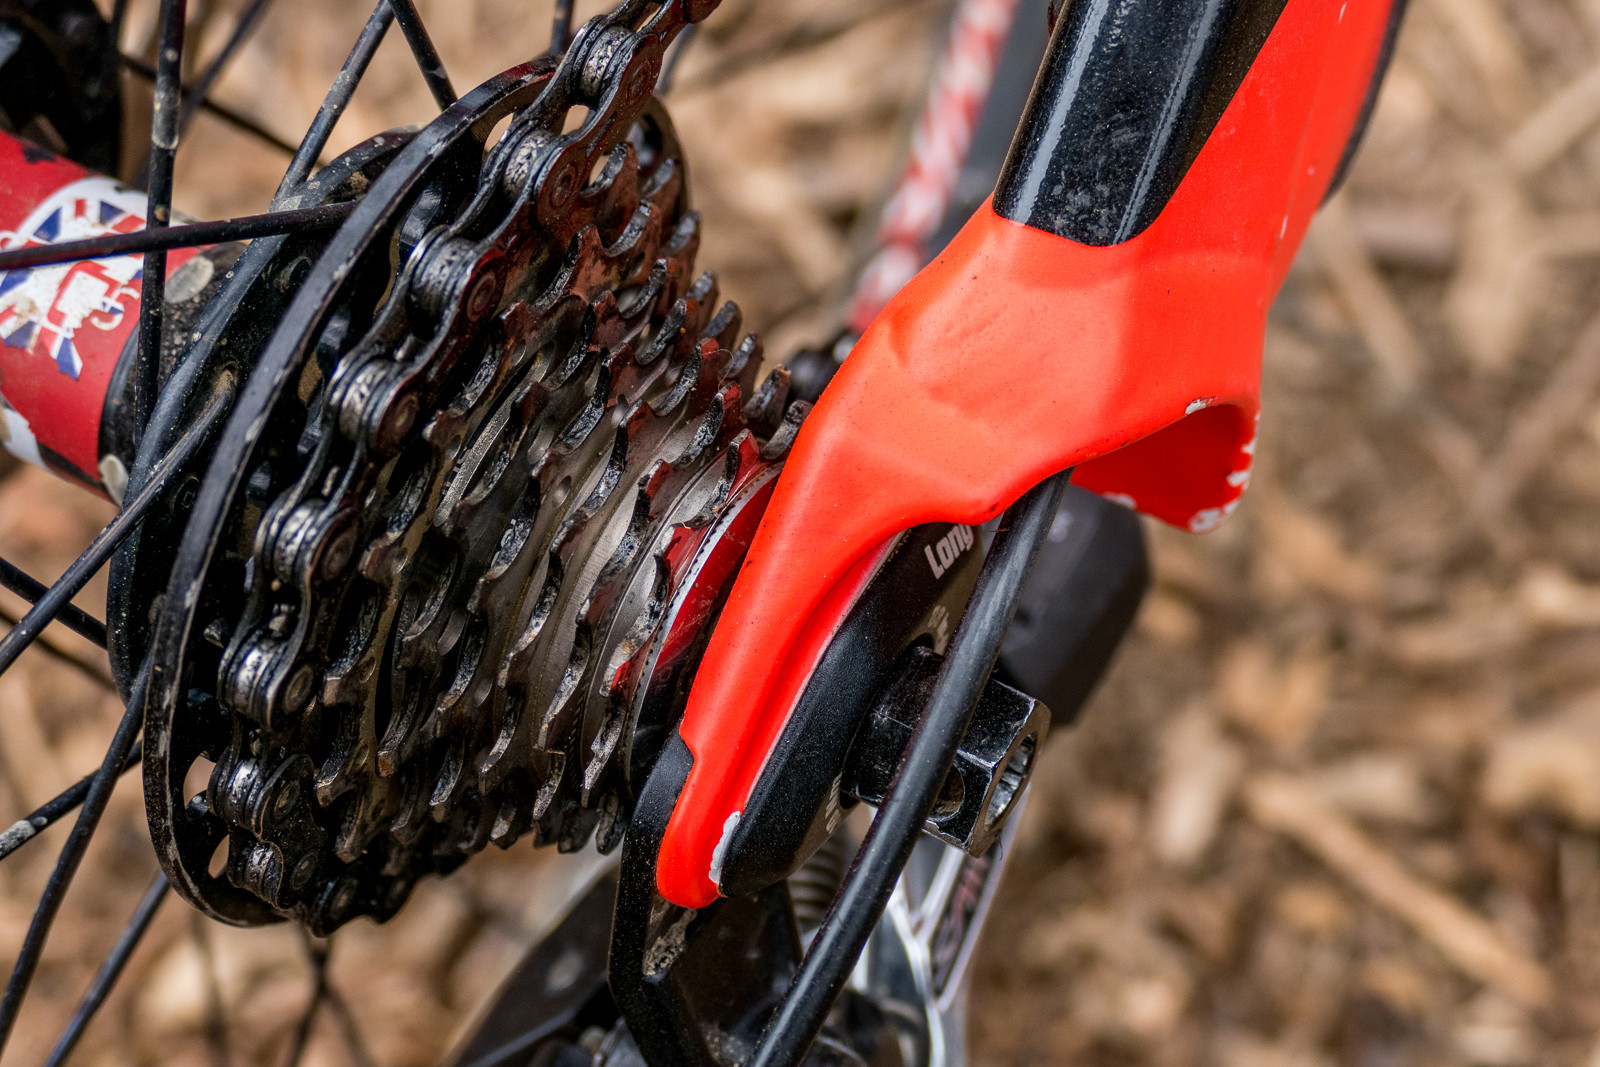 Brendan Fairclough's Gearing - PIT BITS - Crankworx Rotorua - Mountain Biking Pictures - Vital MTB